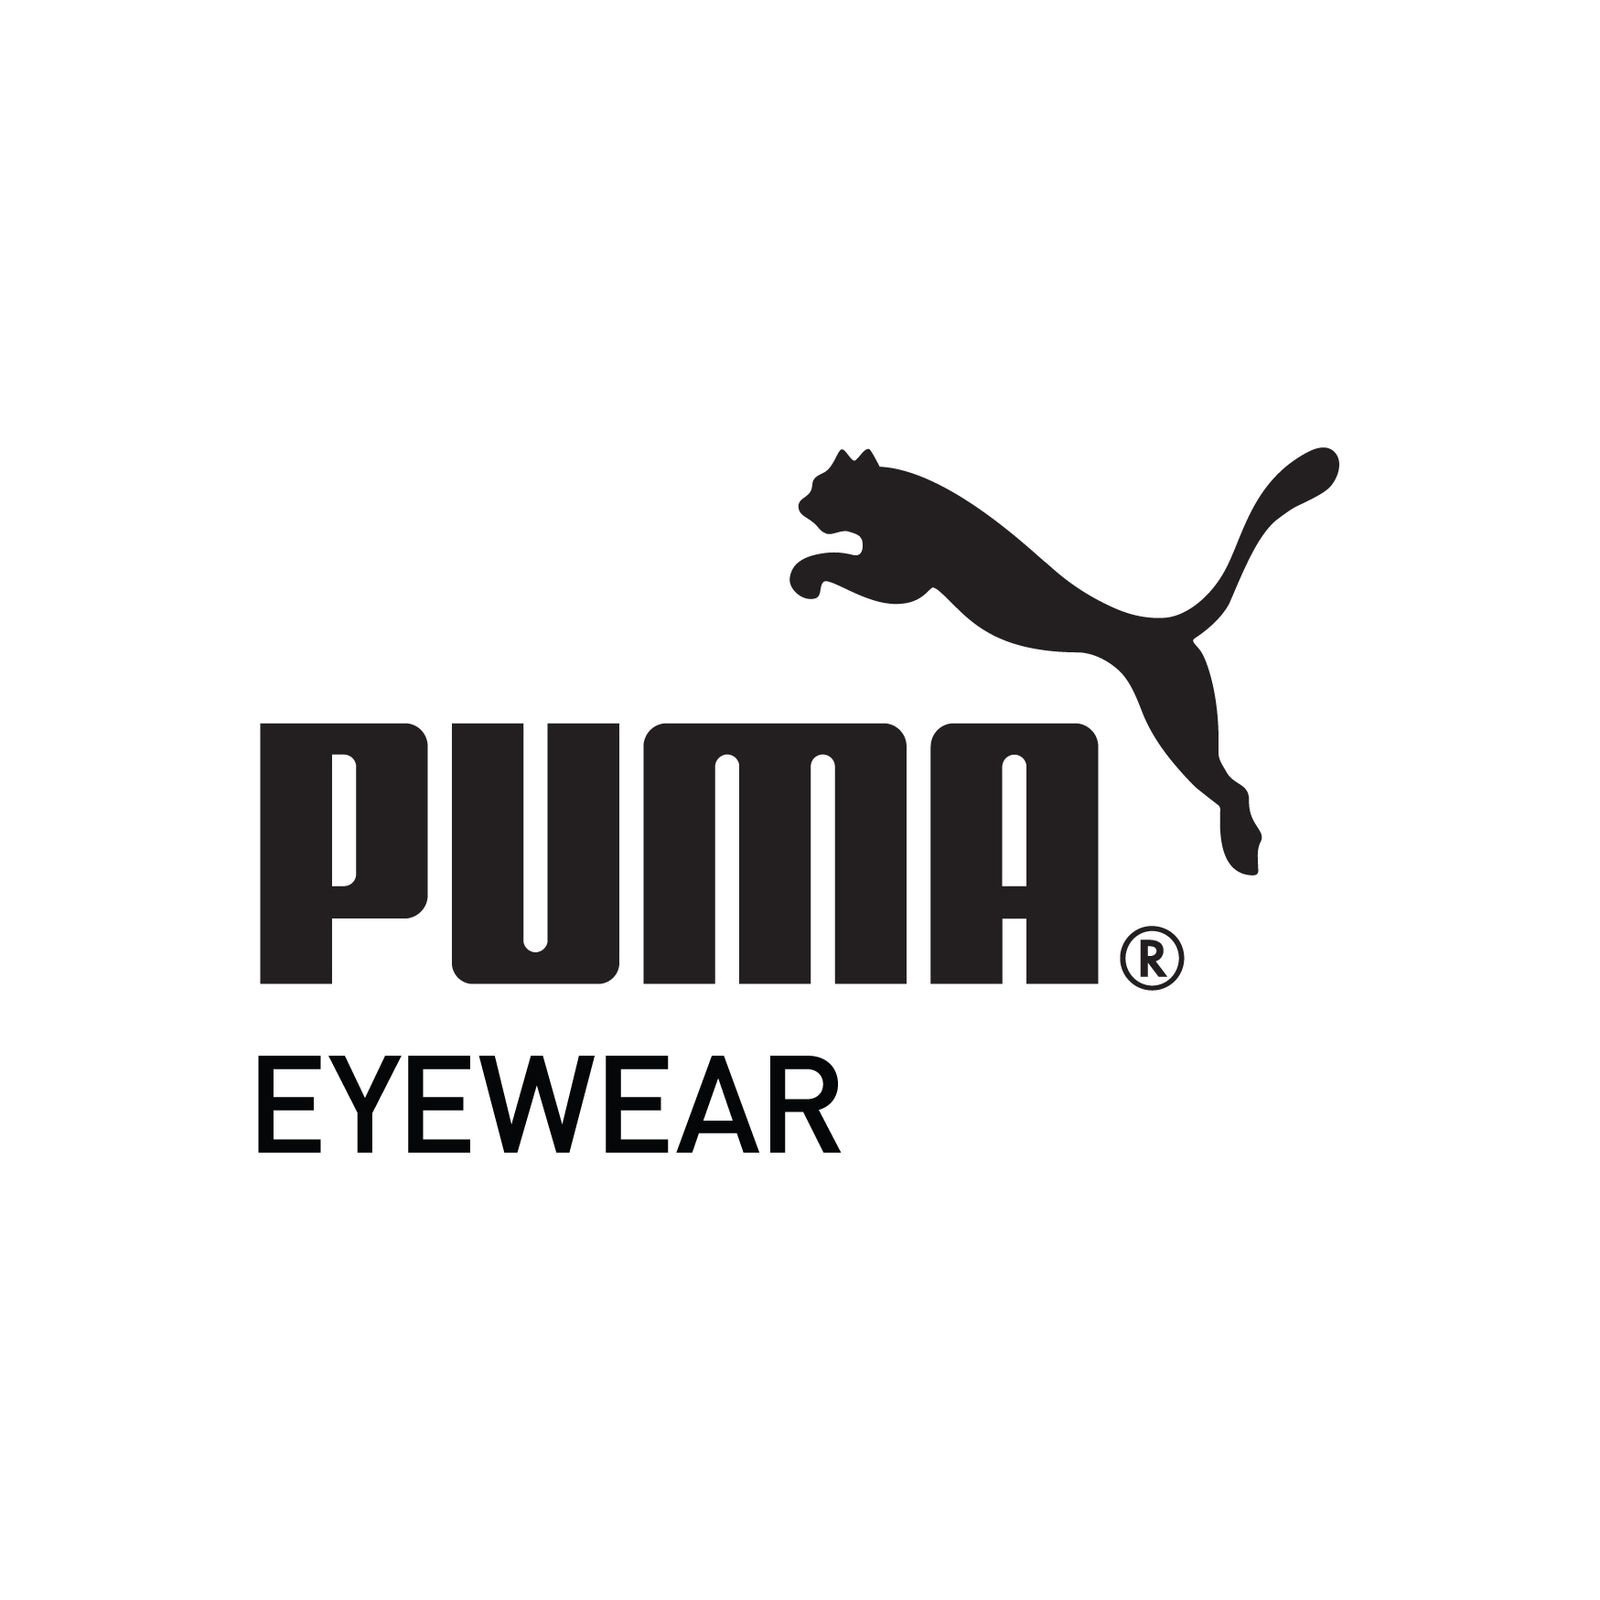 PUMA Eyewear (Bild 1)